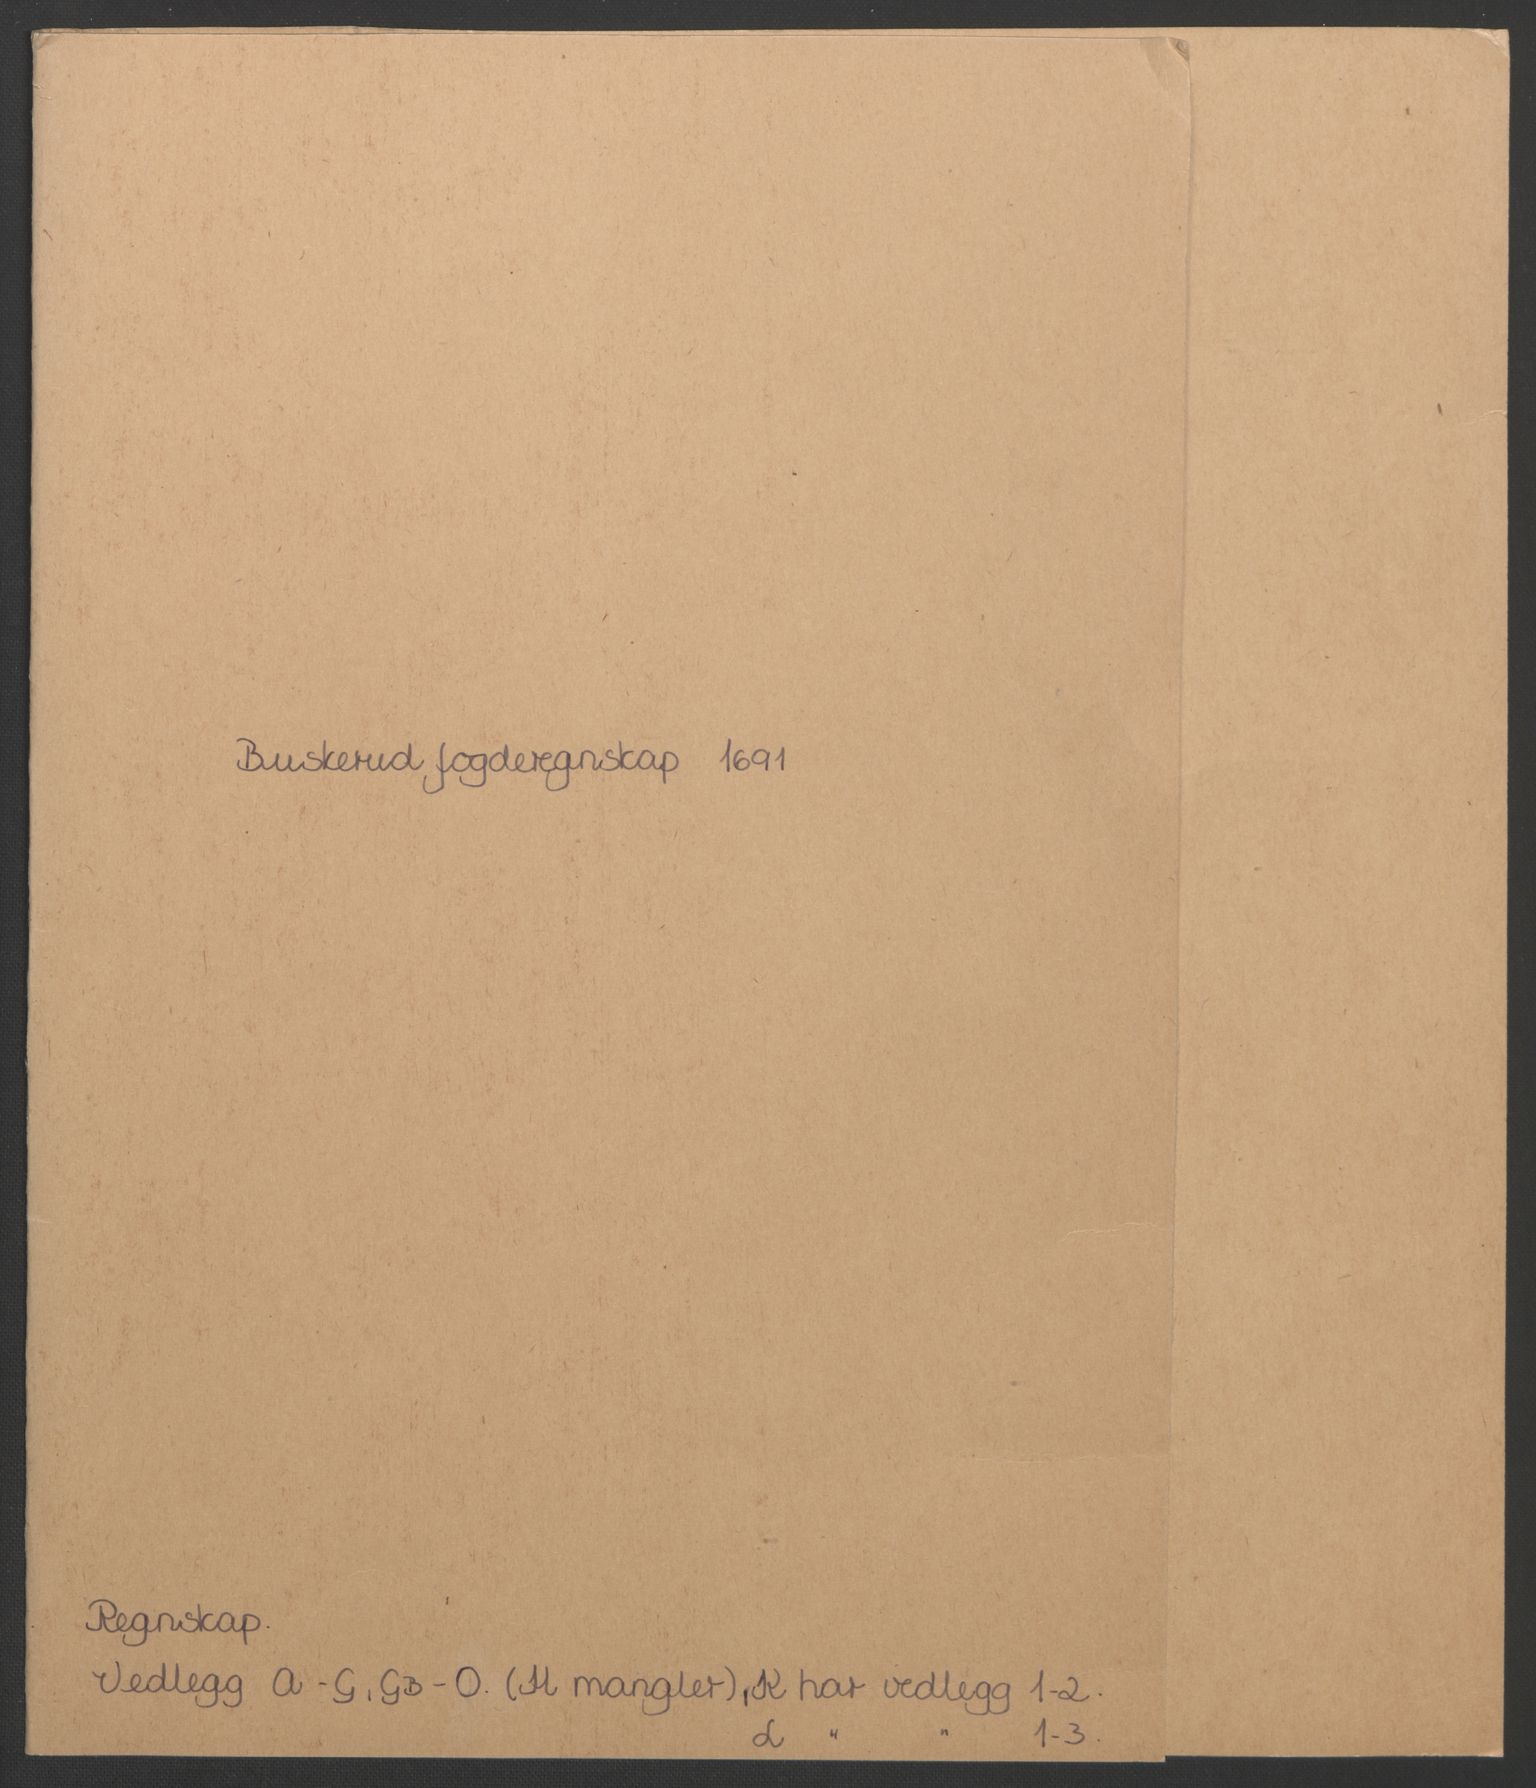 RA, Rentekammeret inntil 1814, Reviderte regnskaper, Fogderegnskap, R25/L1681: Fogderegnskap Buskerud, 1691-1692, s. 2